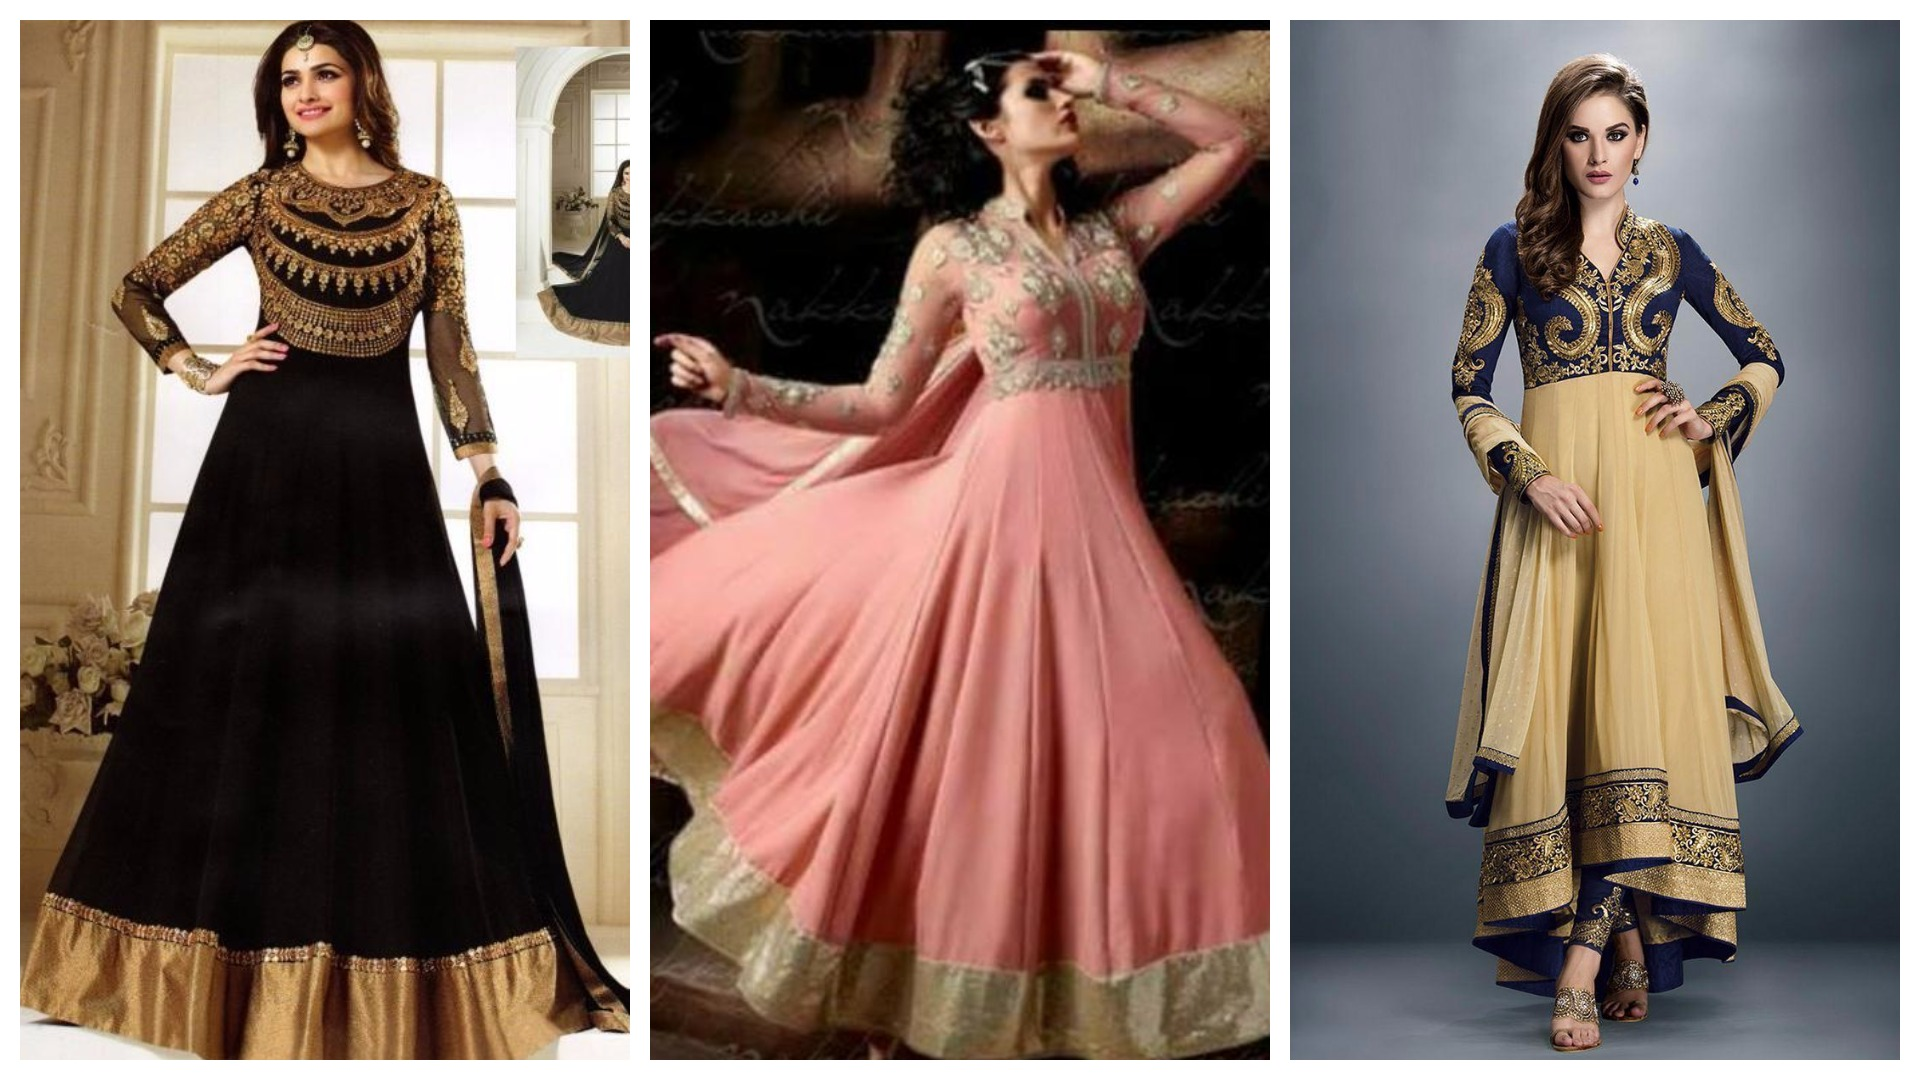 5a26ac6bb تسوق و شراء ملابس و فساتين هندية للبيع اون لاين – Arab Fashion